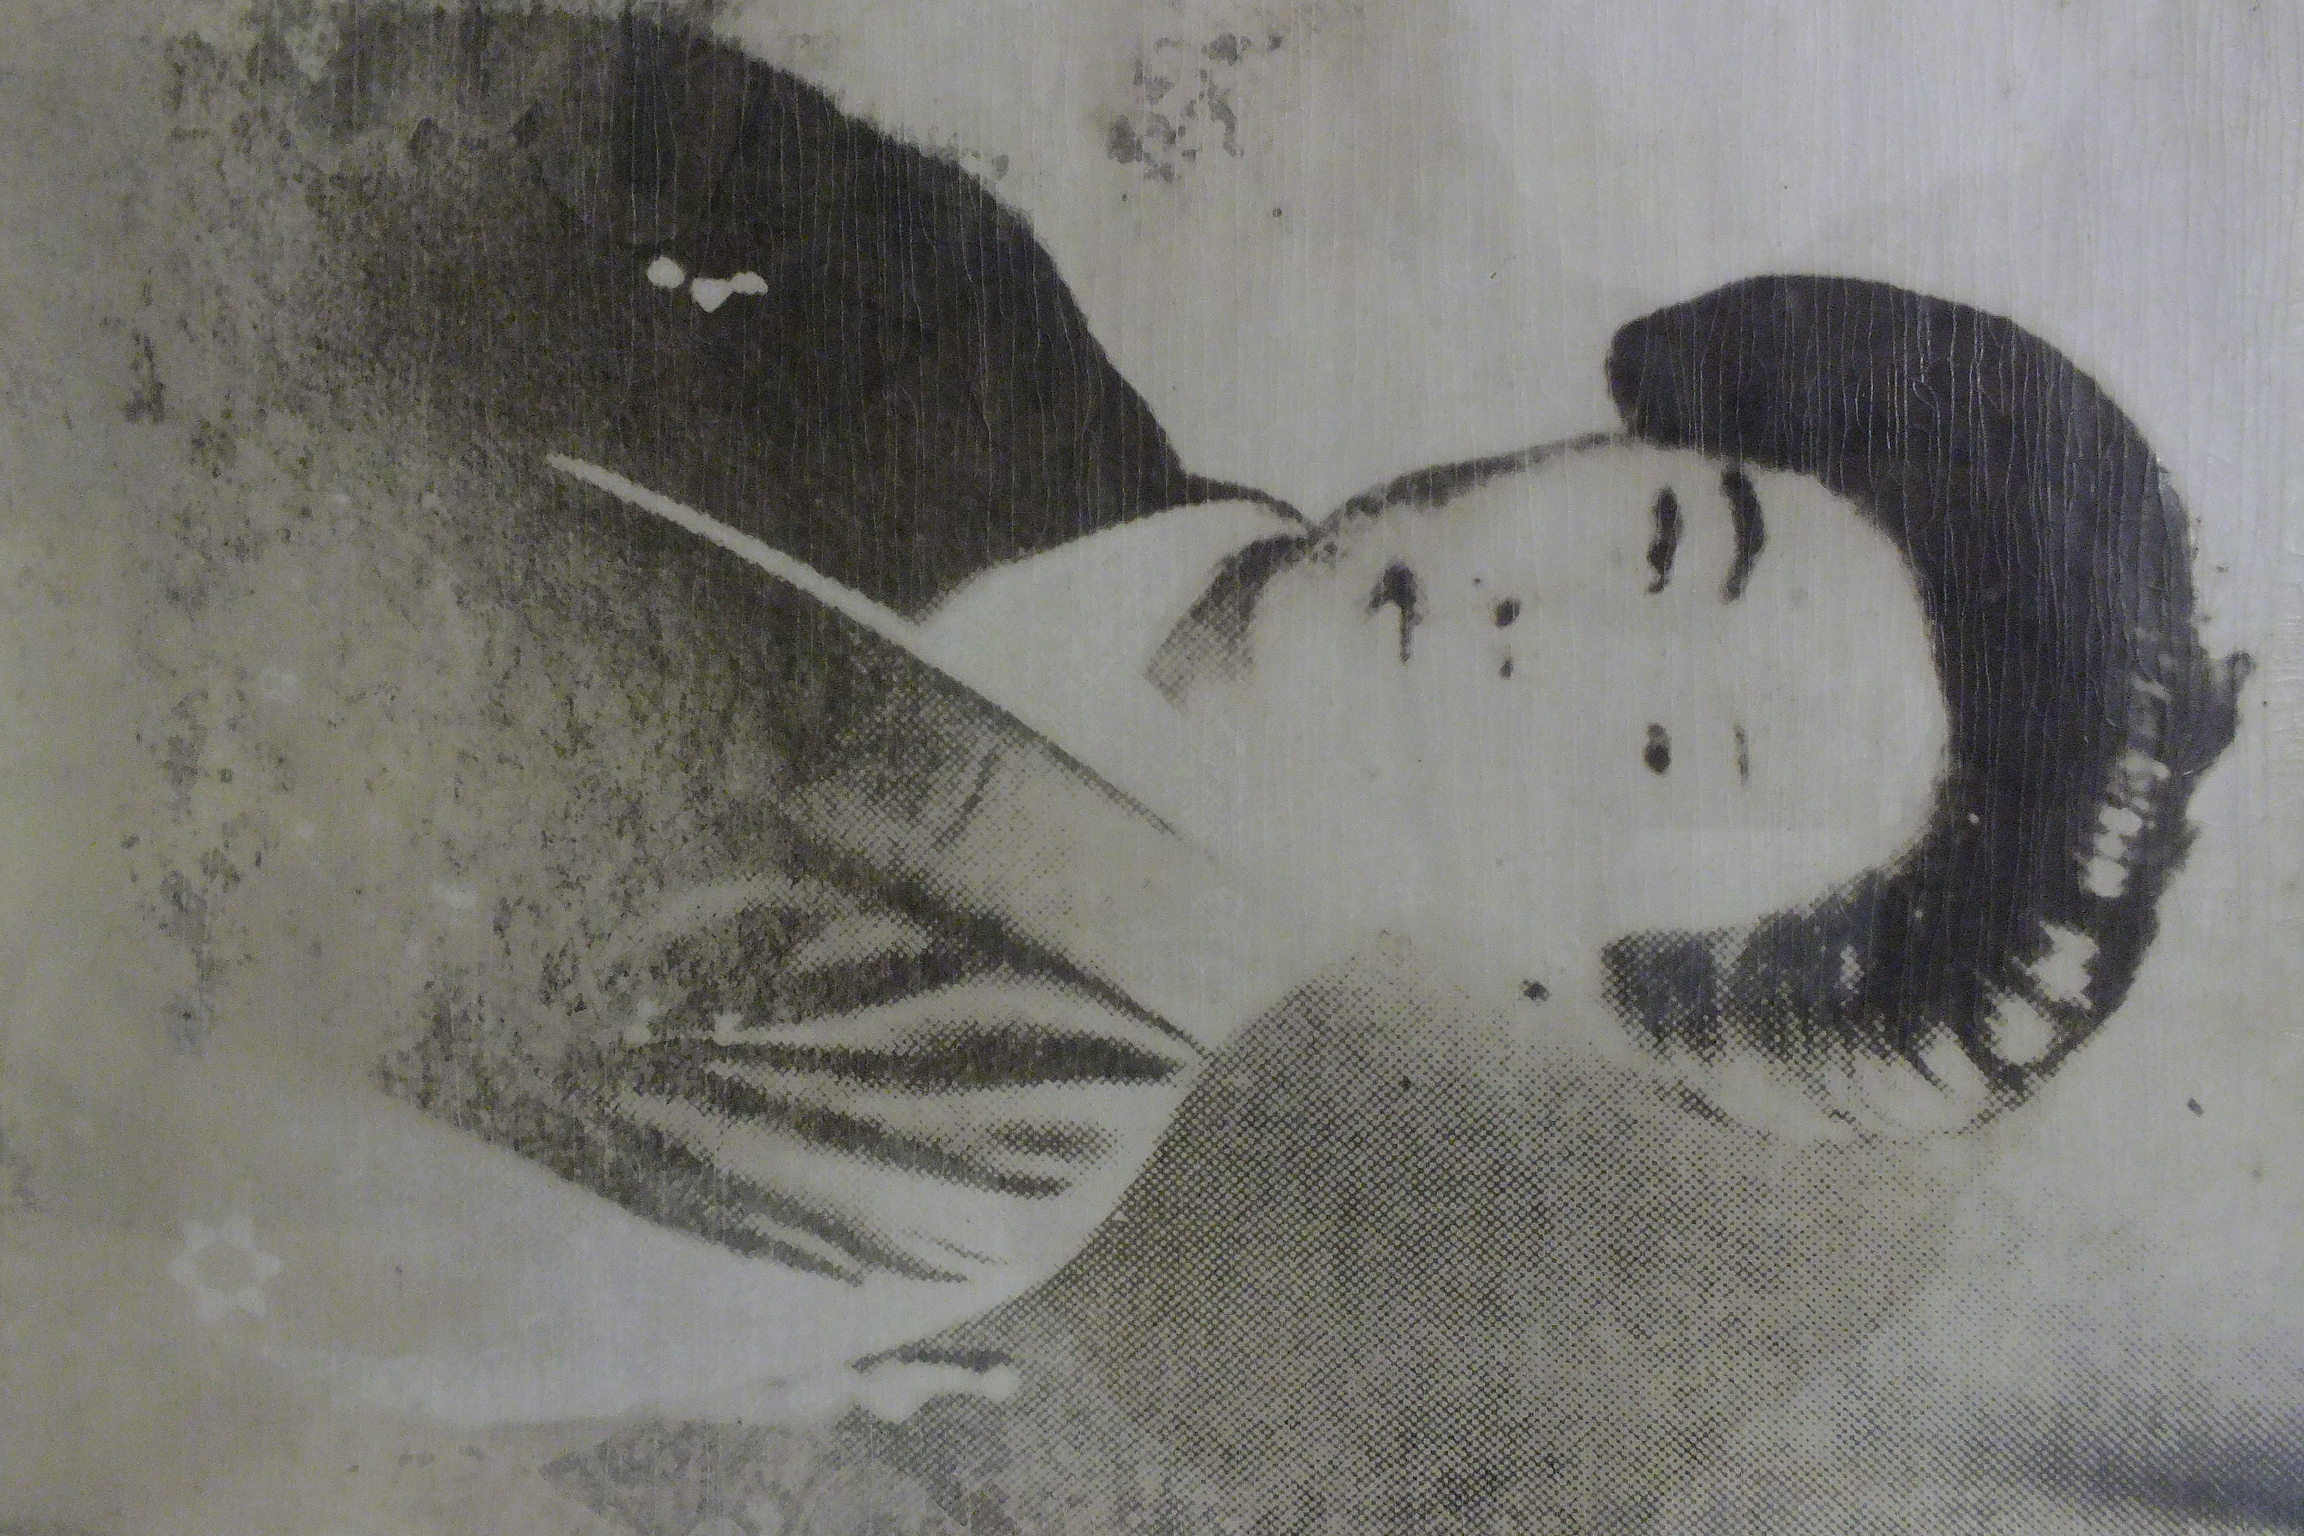 File:2017-07-01 photograph of Chizuko Mifune(御船千鶴子) taken in 1910.jpg - Wikimedia Commons